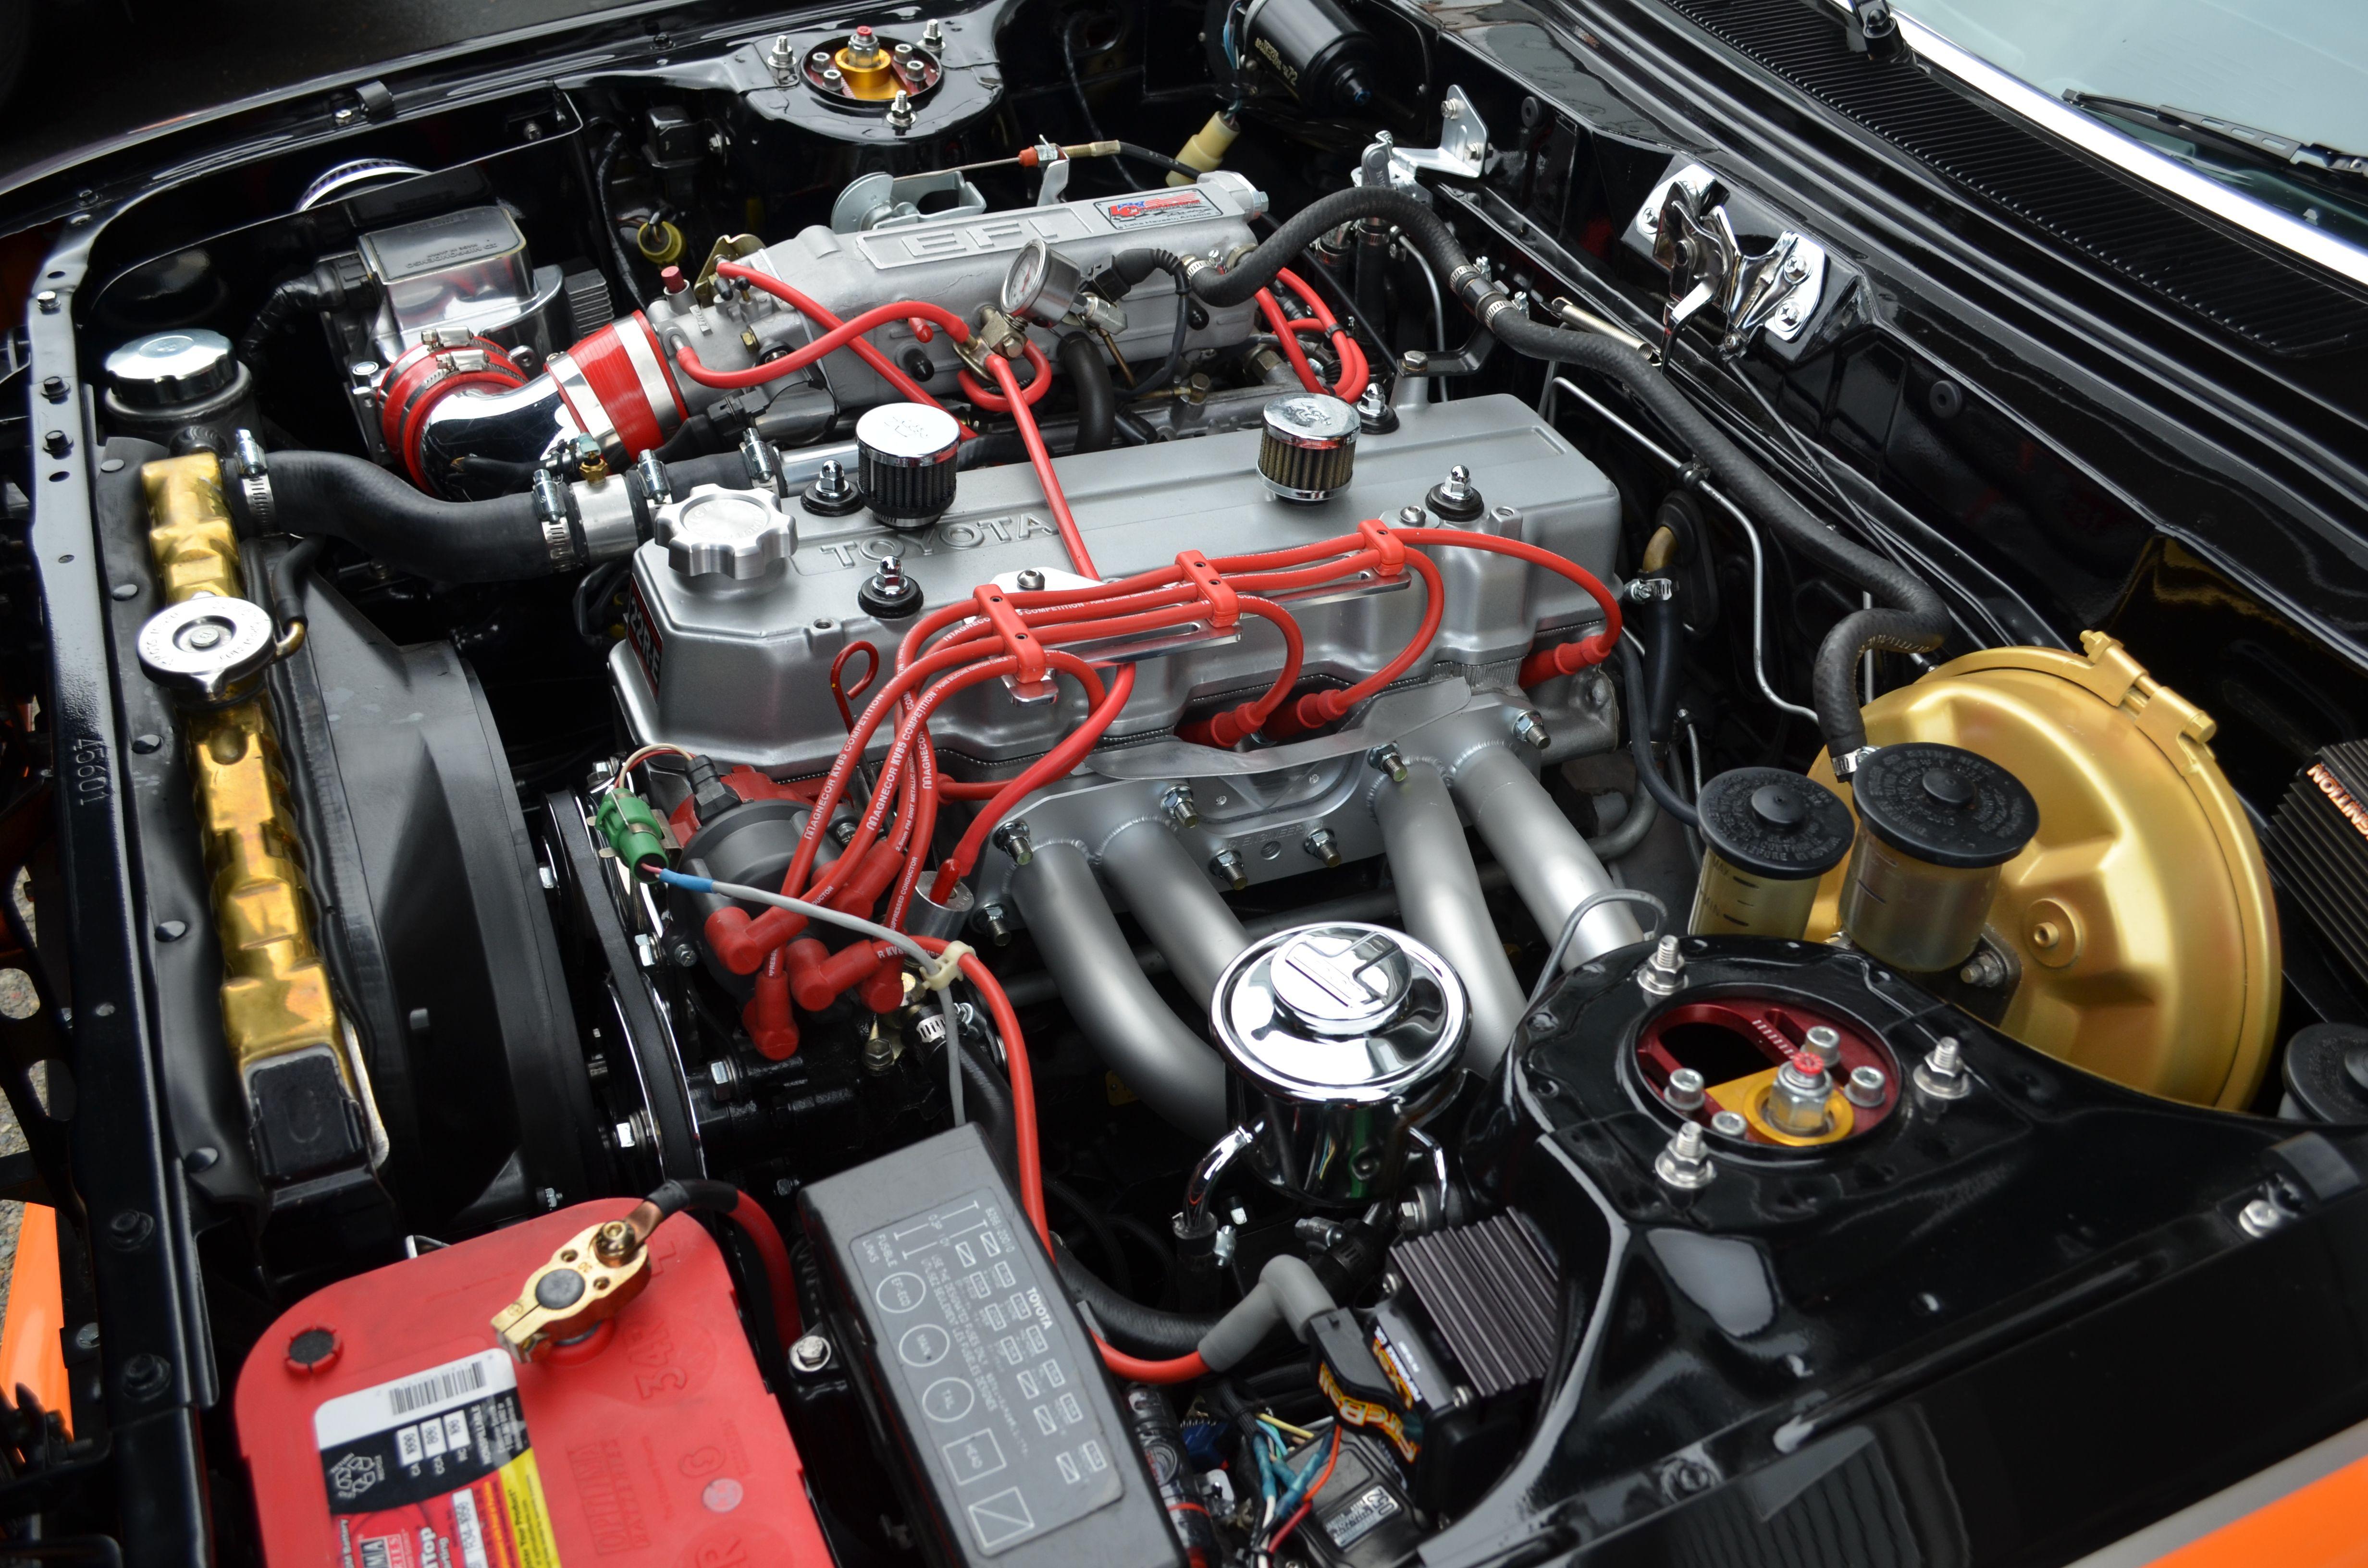 LC ENGINEERING Reader Rides | #ToyotasDoItBetter | Pinterest